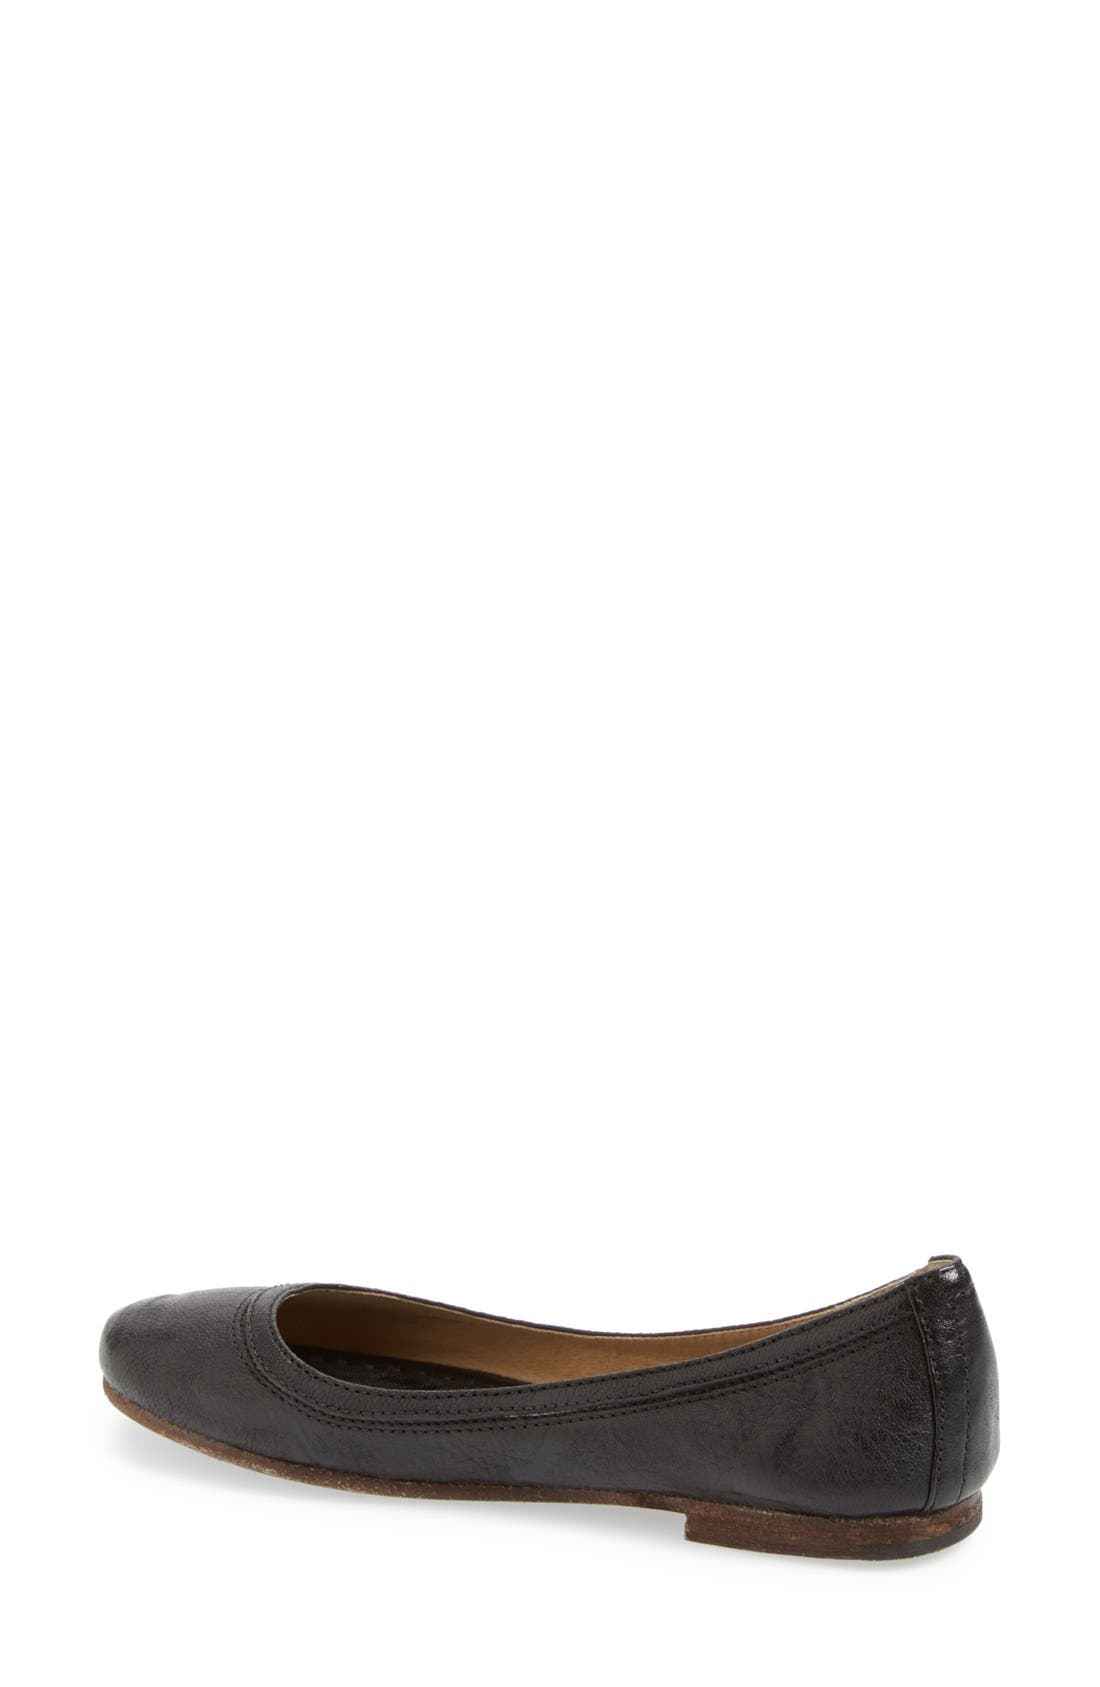 'Carson' Ballet Flat,                             Alternate thumbnail 2, color,                             Black/ Black Leather